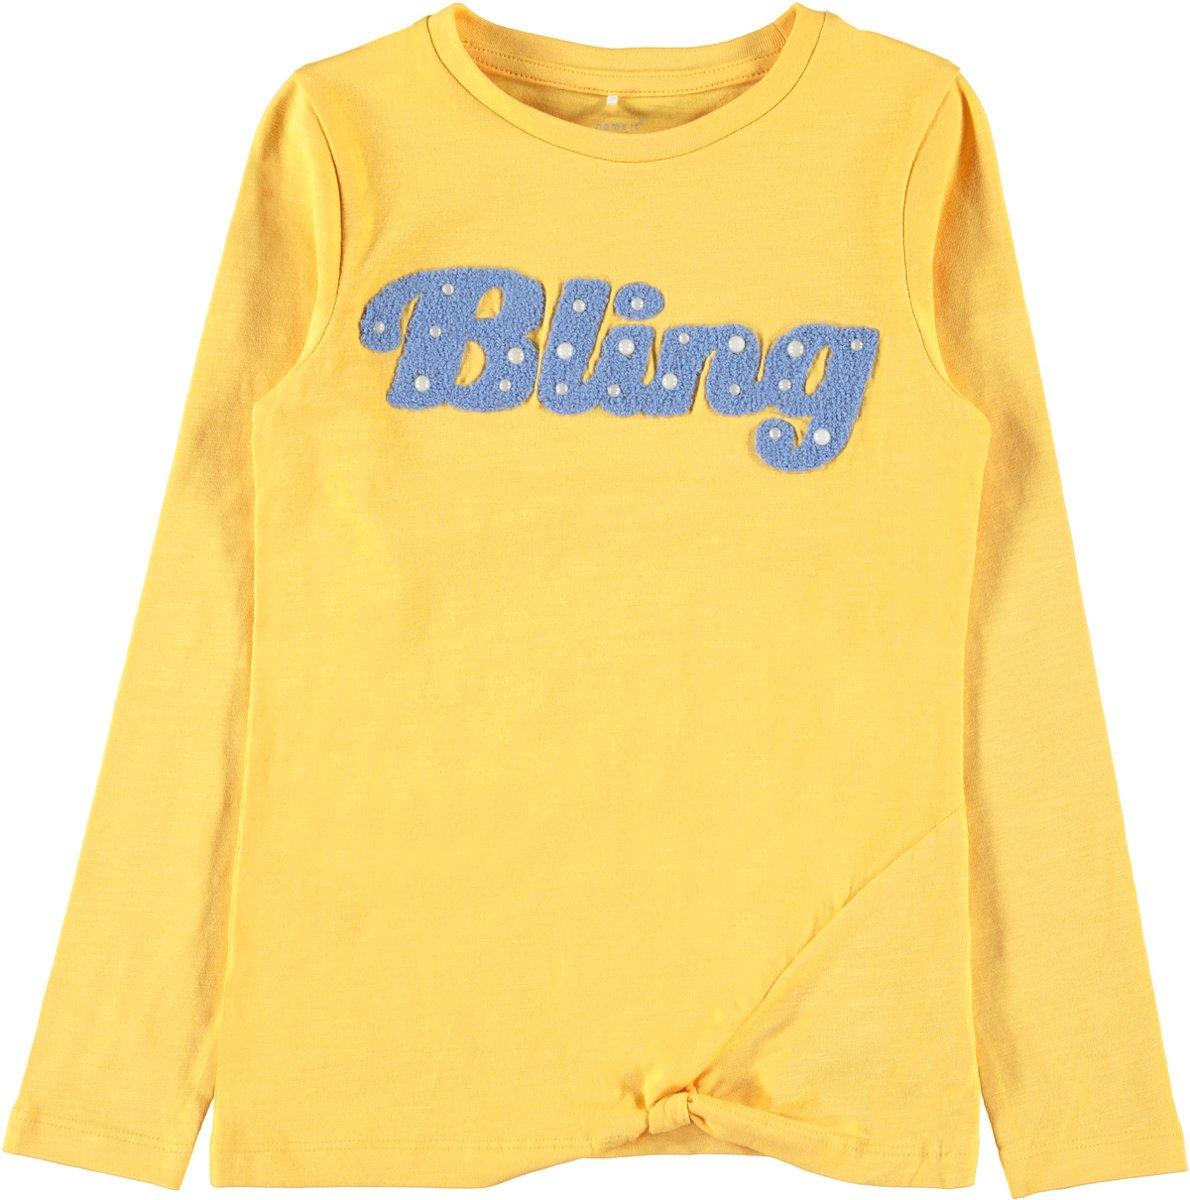 Long Sleeved Brown Stripes Disciplined Jones New York Sweater Size Large Sport